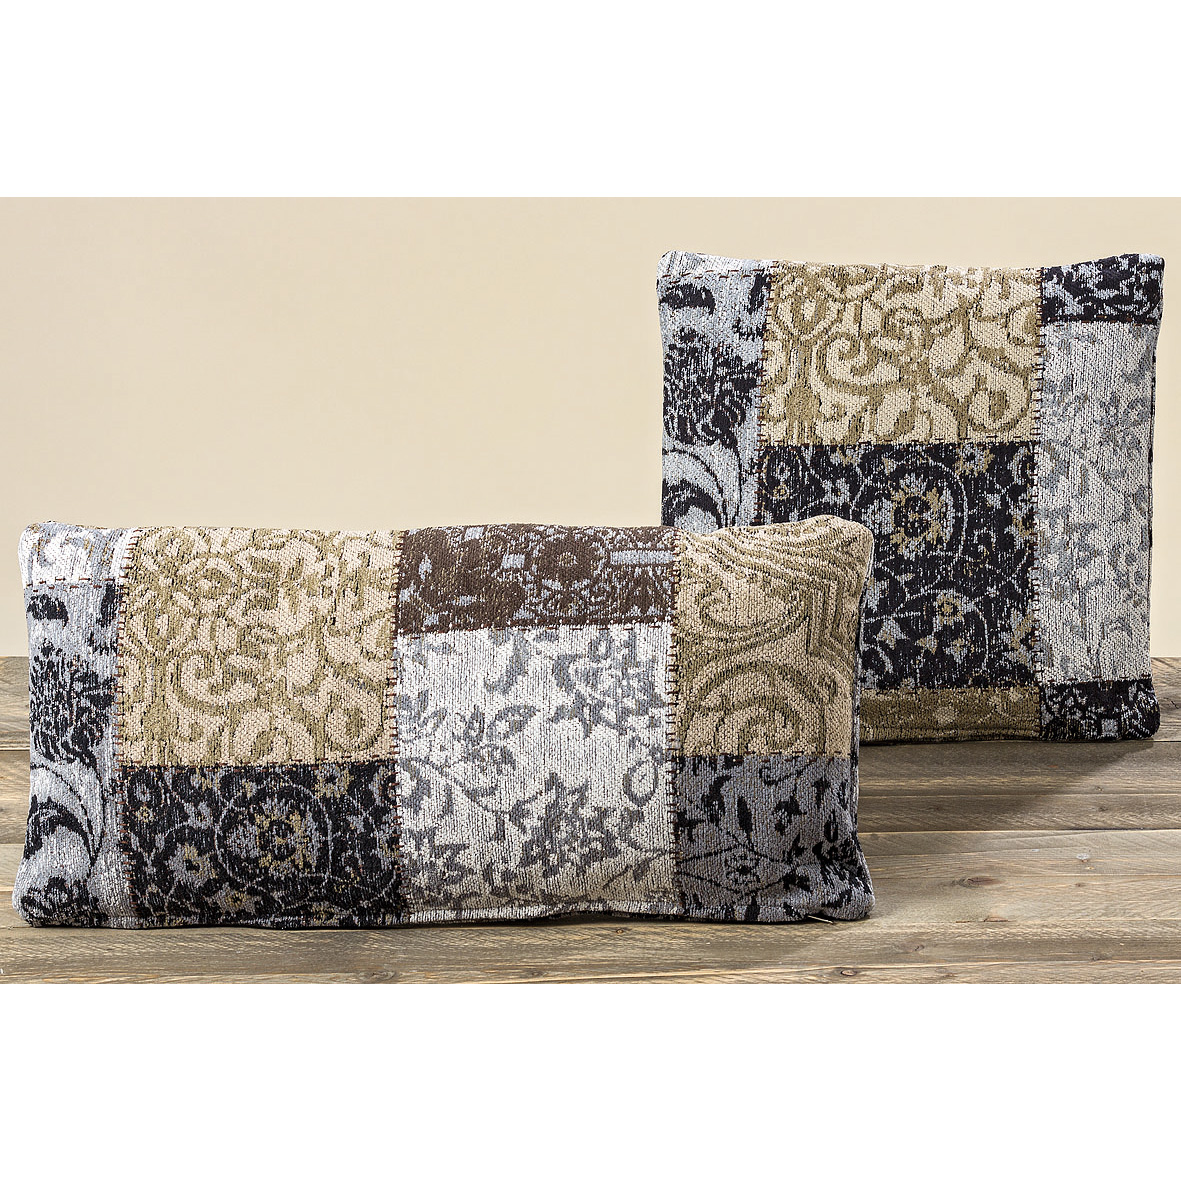 patchwork kissen gobelin vintage grau braun 70x35cm. Black Bedroom Furniture Sets. Home Design Ideas